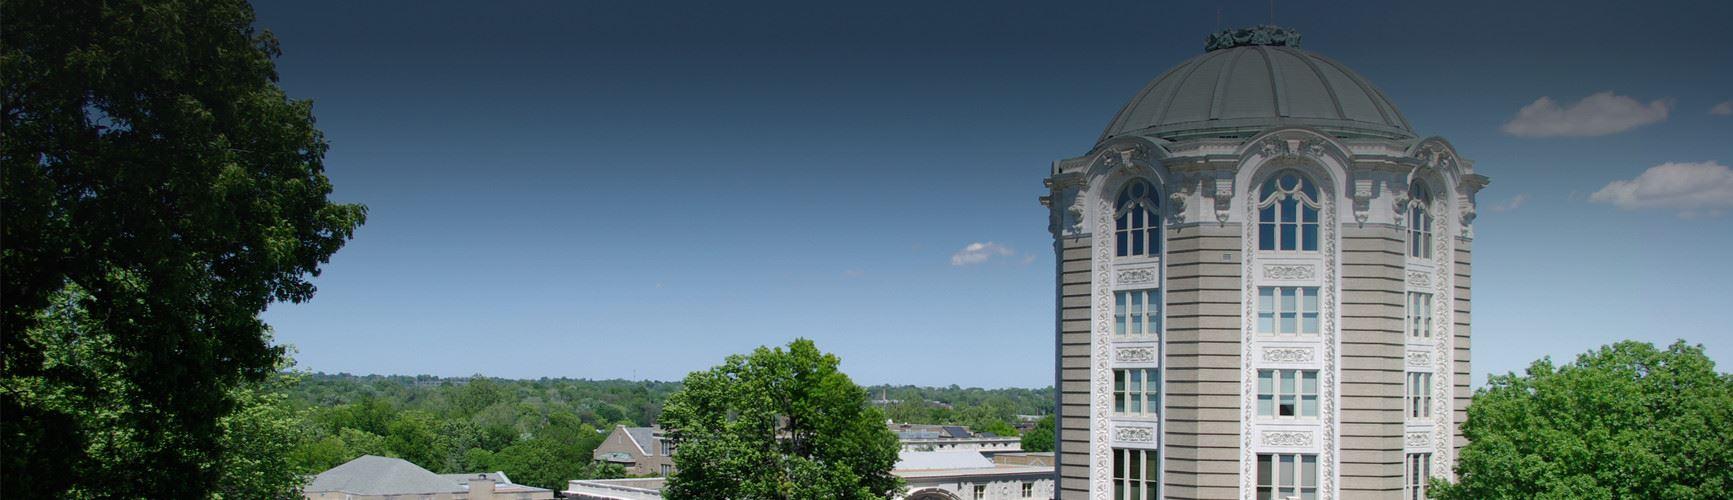 University City, MO - Official Website